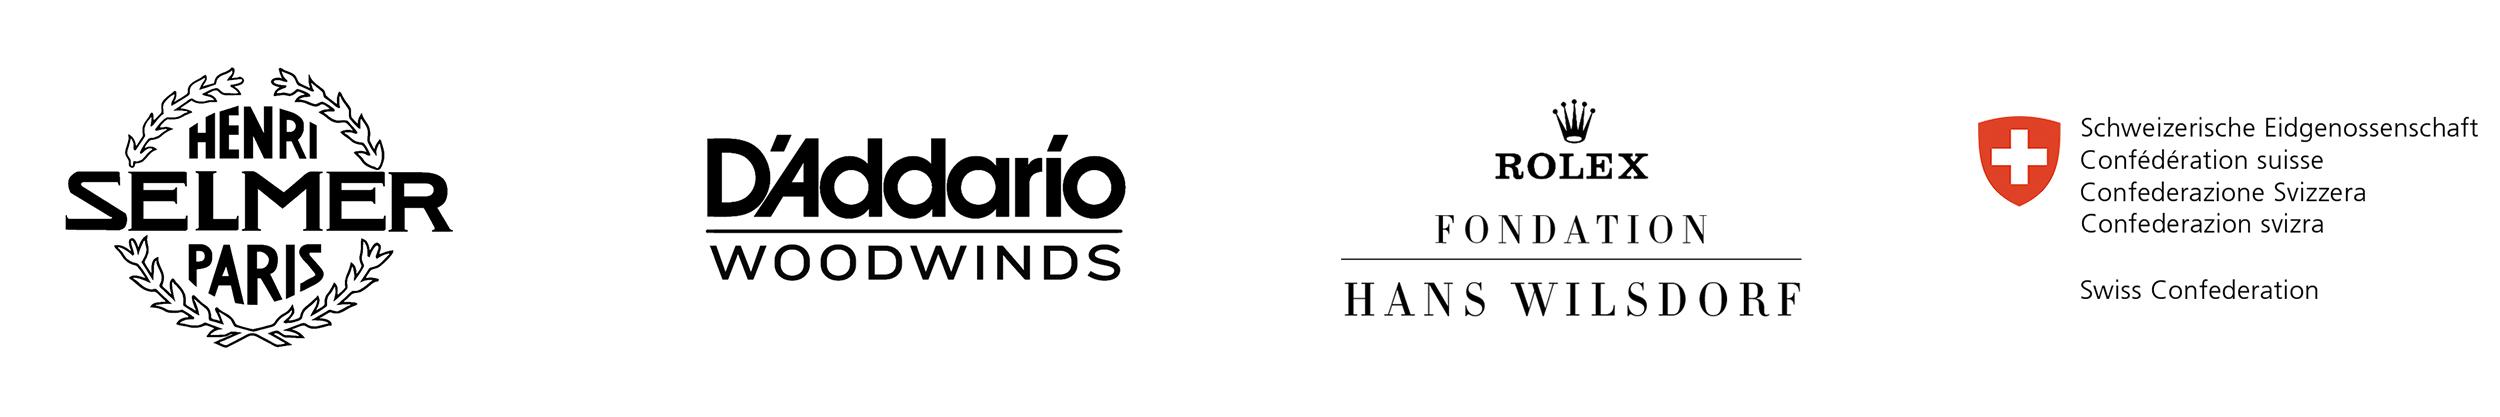 Sponsors+Partners: Henri Selmer Paris Clarinets, D'Addario Woodwinds, Rolex Fondation, Swiss Confederation